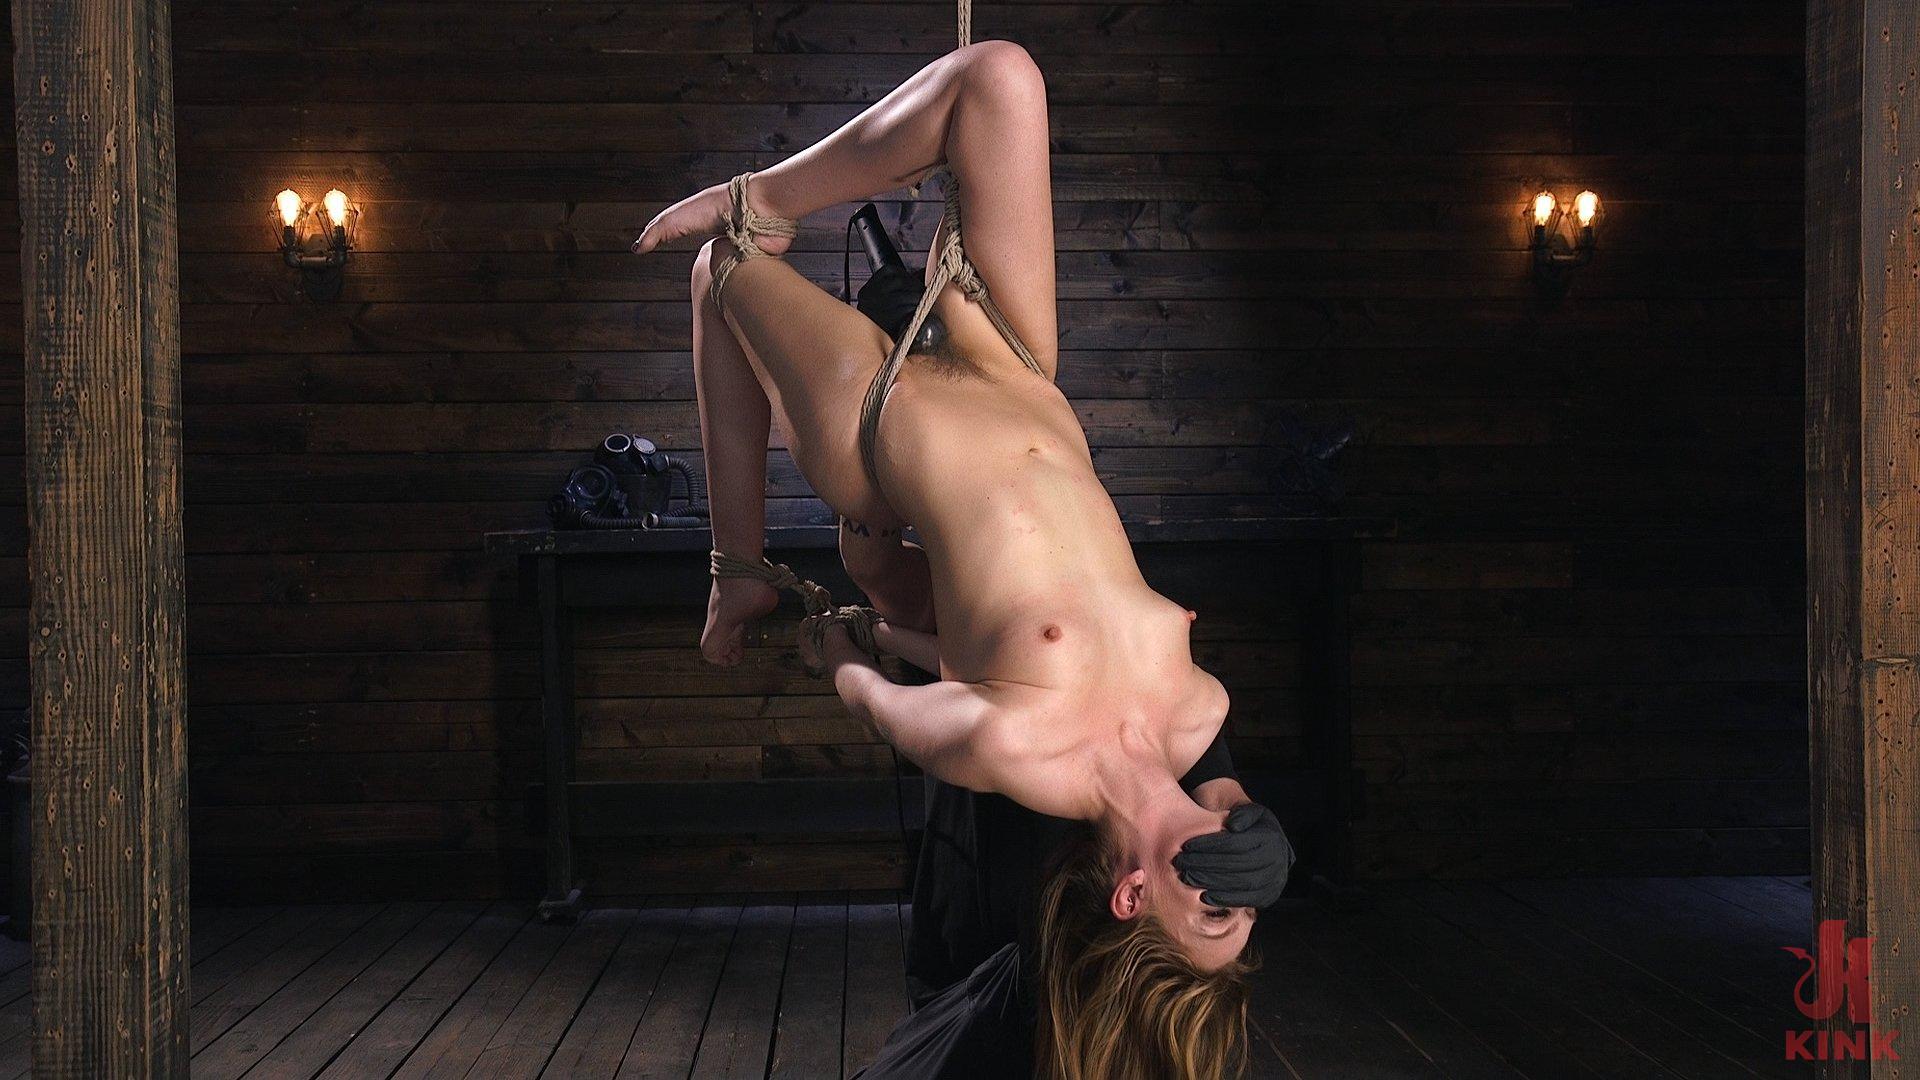 Photo number 8 from Brutal Predicament Bondage, Grueling Torment, and Mind Blowing Orgasms shot for Hogtied on Kink.com. Featuring Maya Kendrick in hardcore BDSM & Fetish porn.